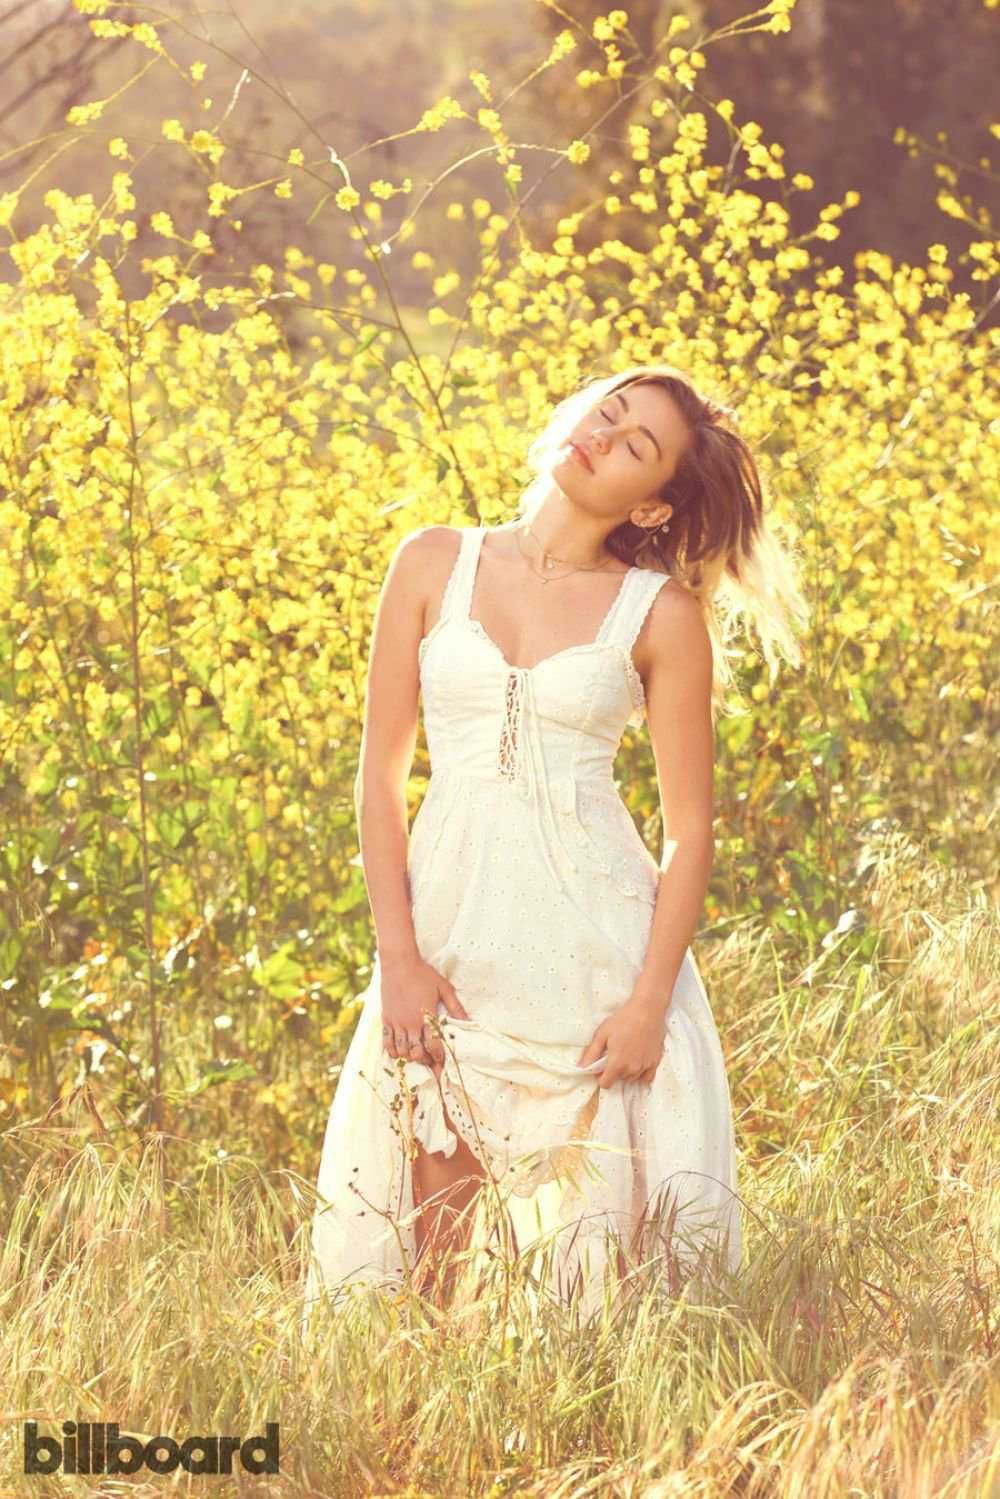 Miley cyrus billboard magazine may